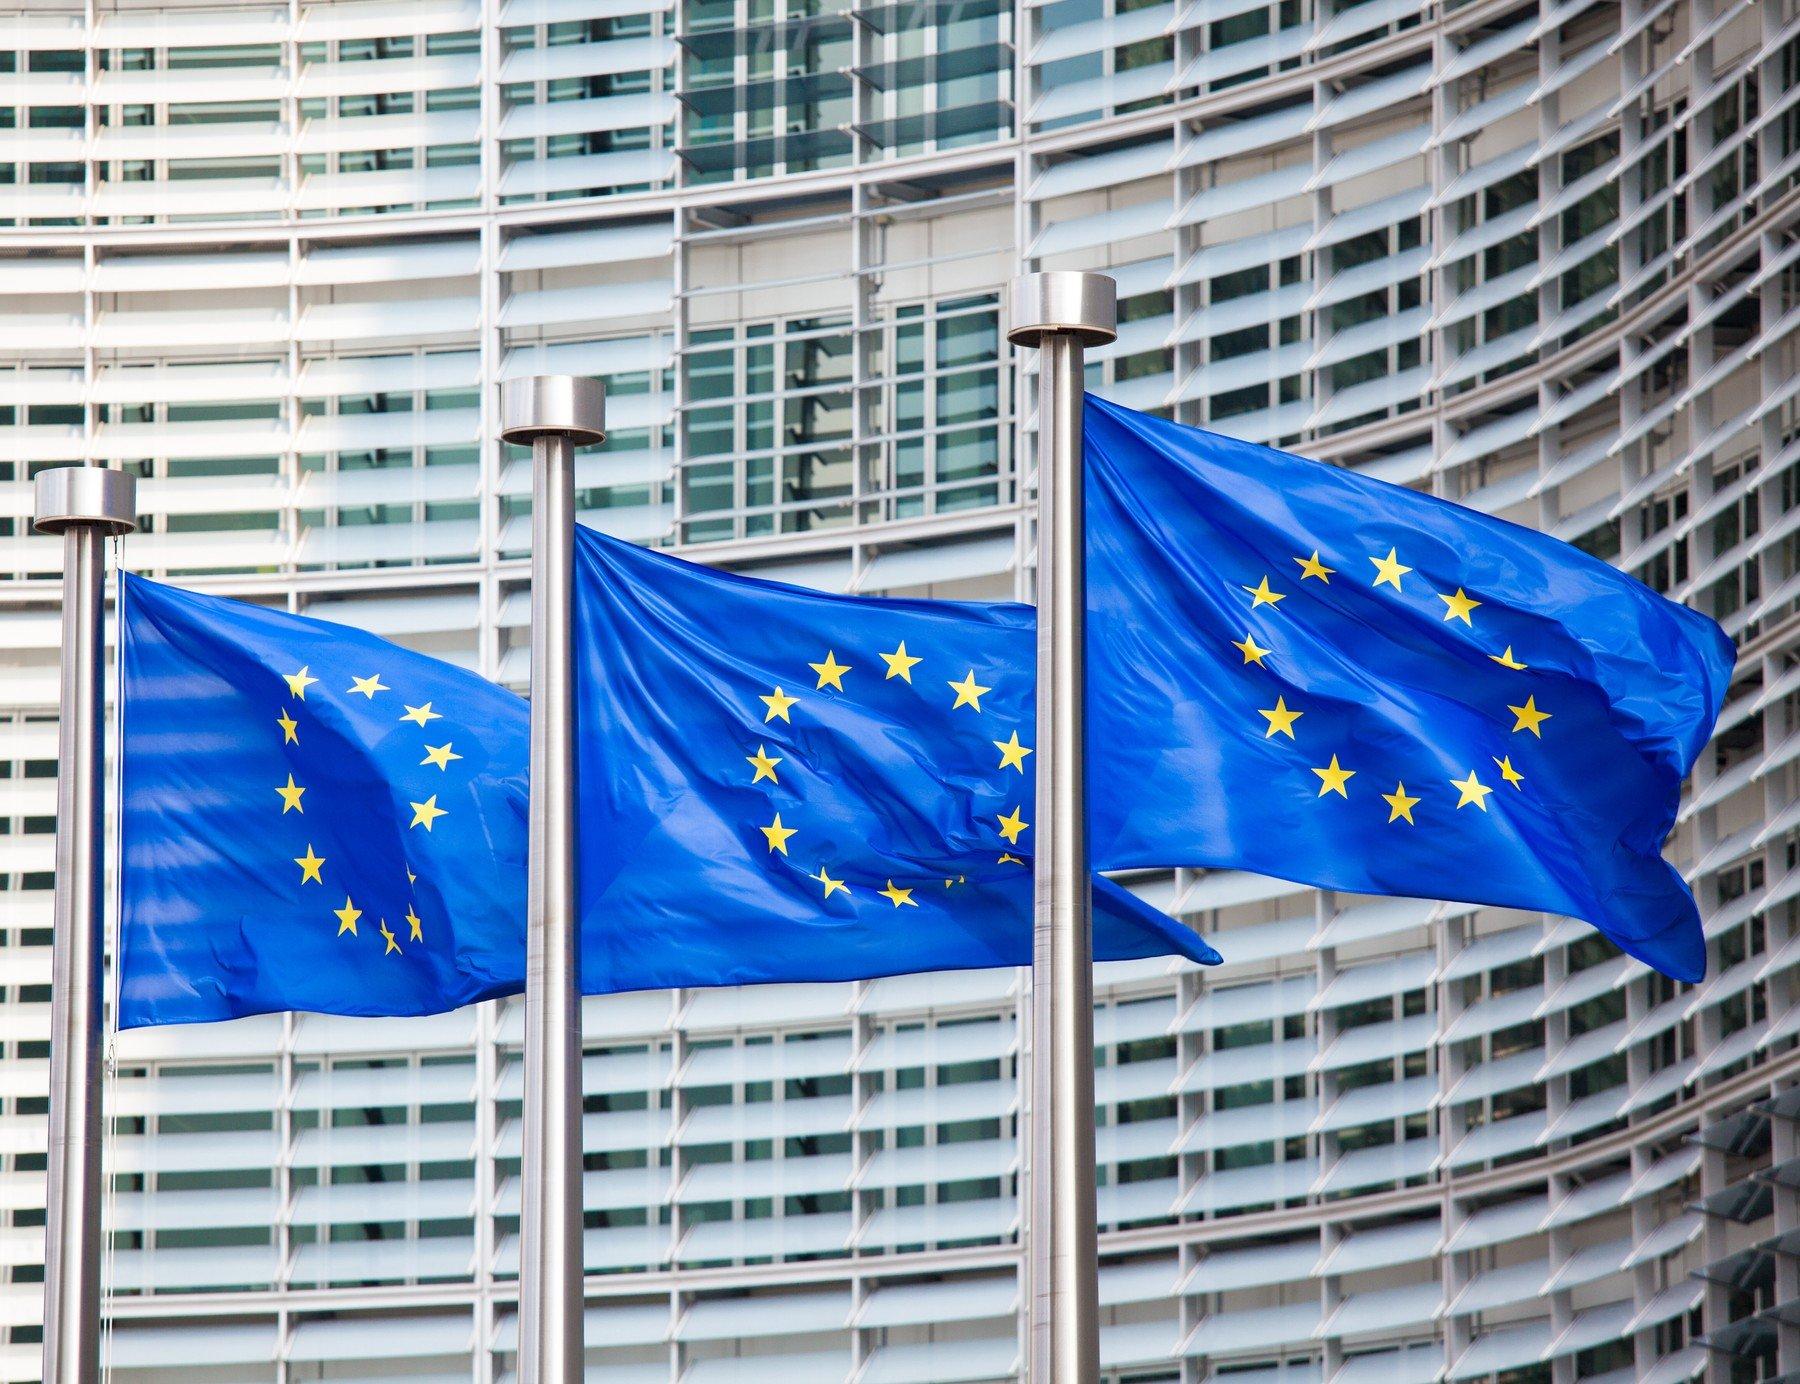 Zastave EU ispred sjedišta EK u Bruxellesu